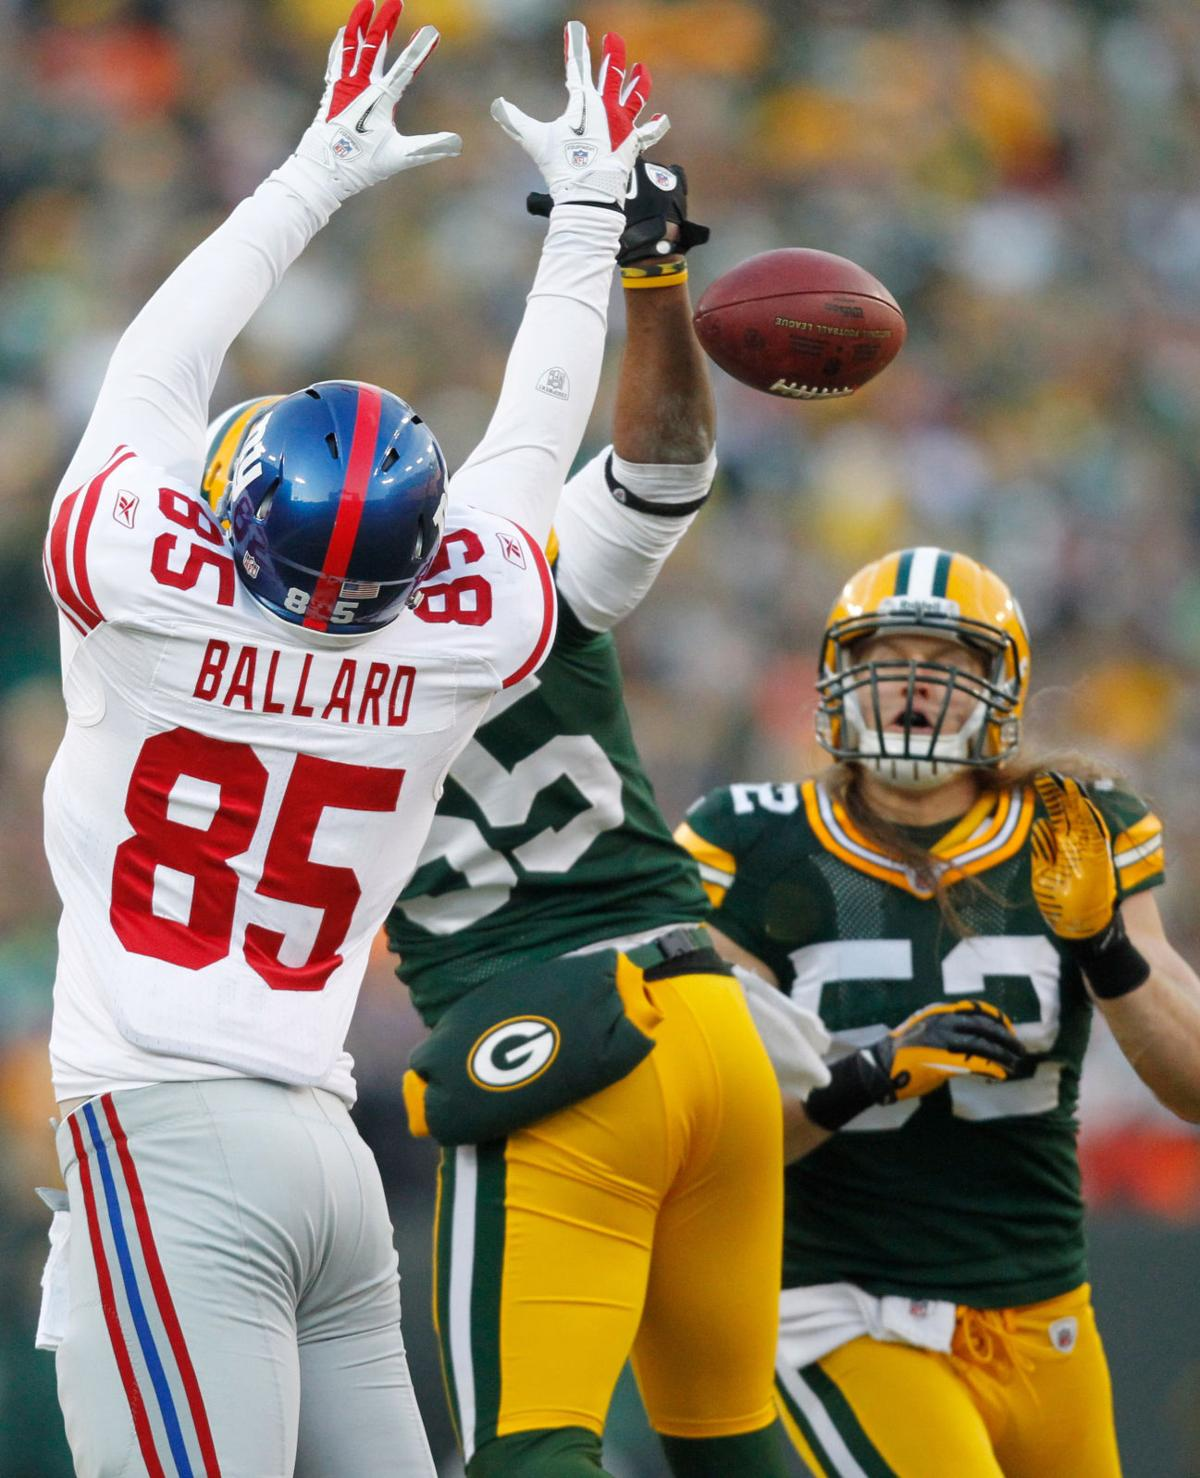 Green Bay Packers vs. New York Giants, NFL Football